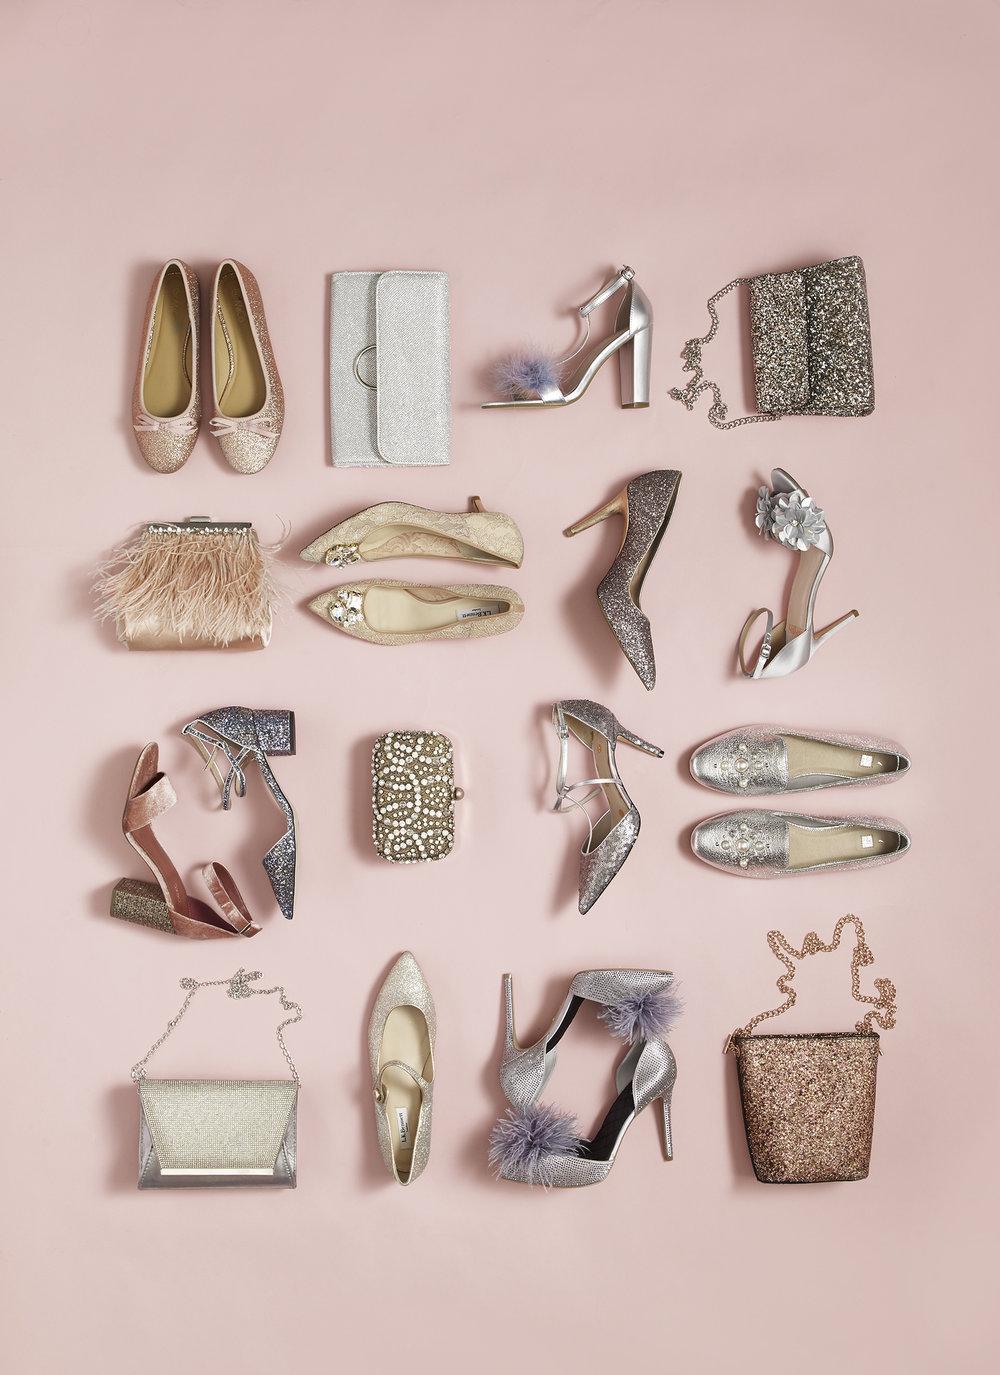 18152_lifestyleHUB_overheads_pink main.jpg